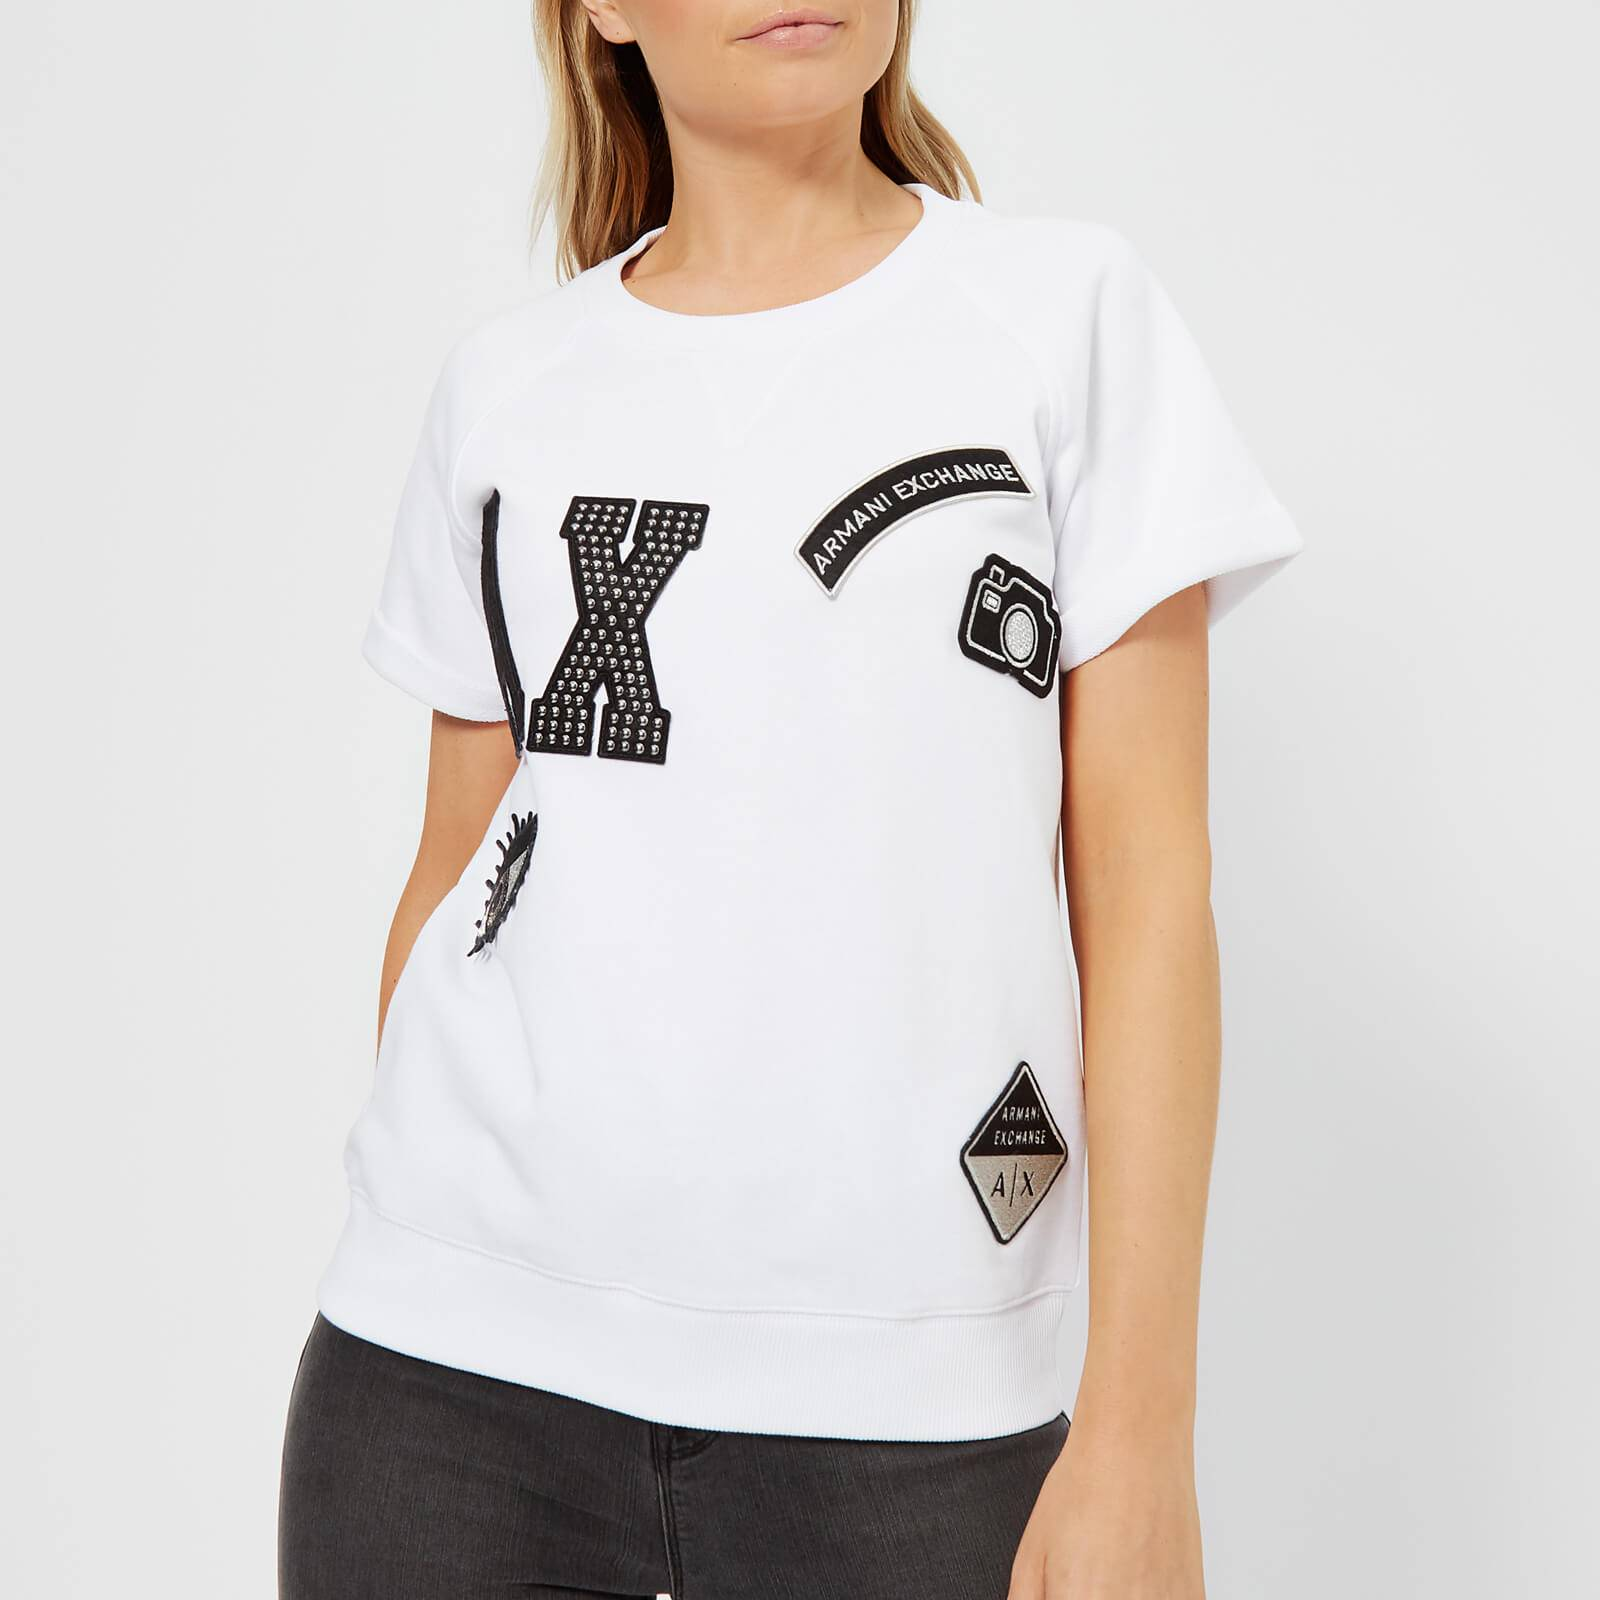 Armani Exchange Women's Patchwork T-Shirt - White - XS - White